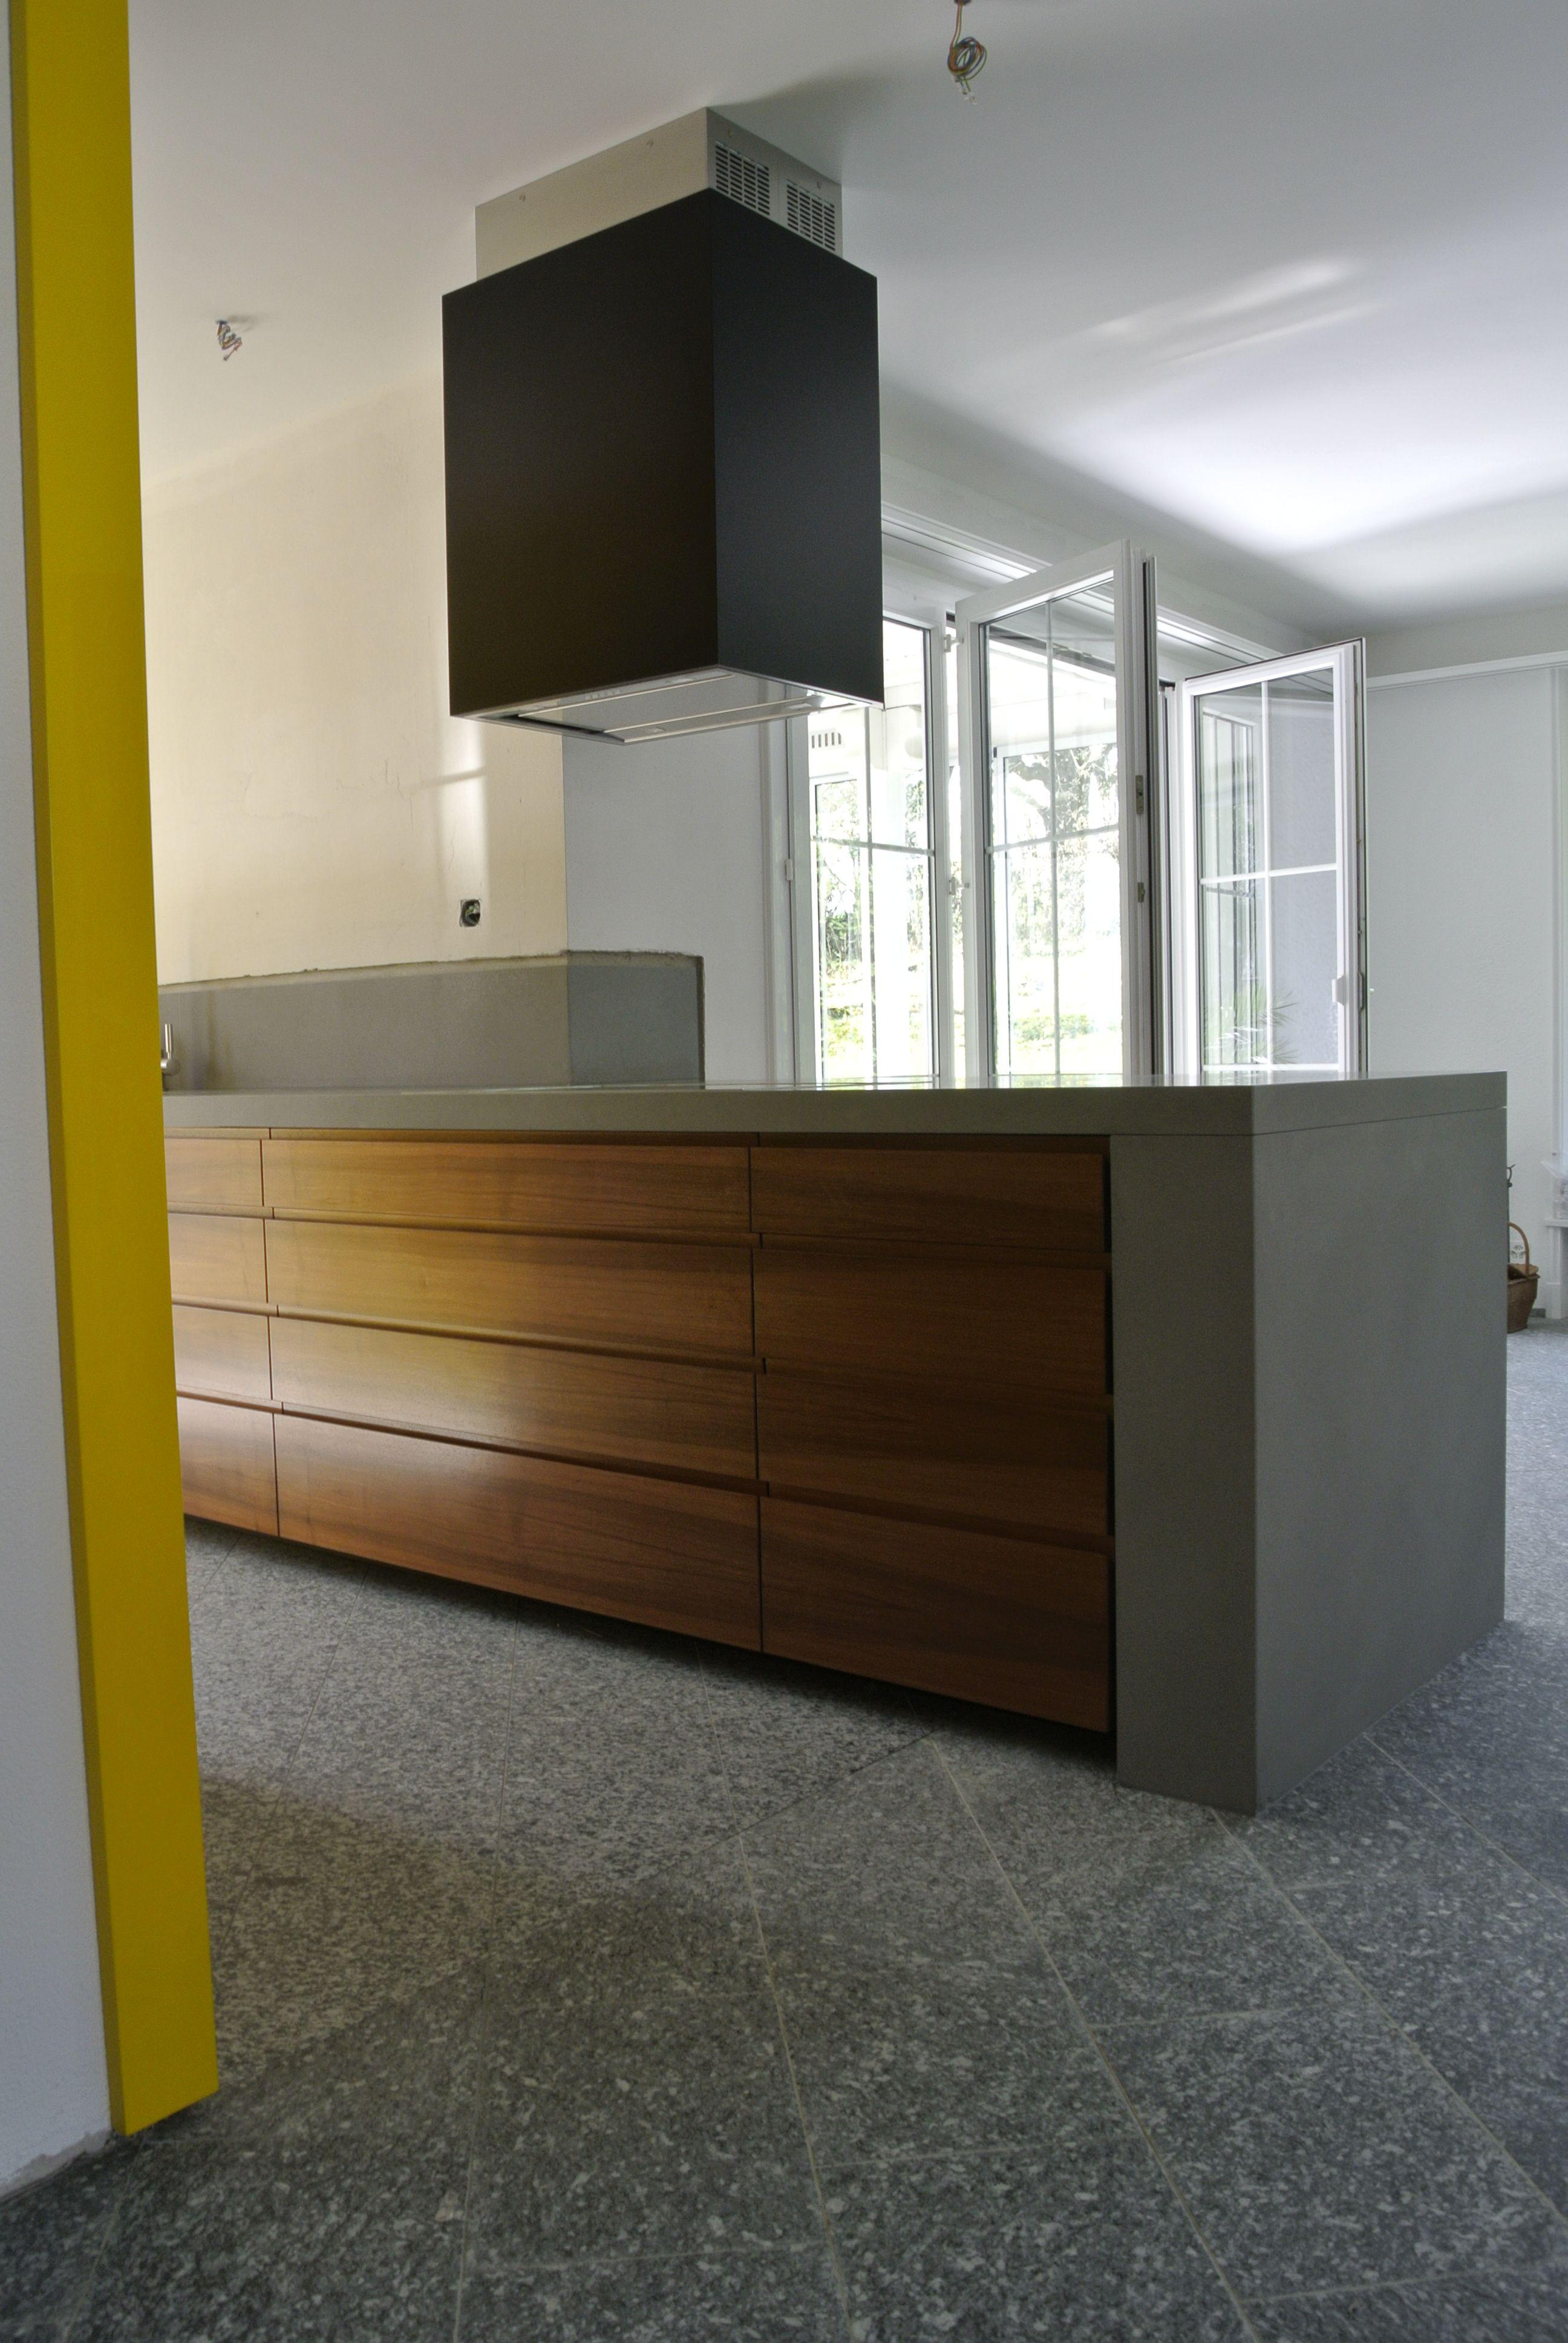 Cucina Moderna Noce Canaletto | Cucina Lineare Dal Design Moderno ...